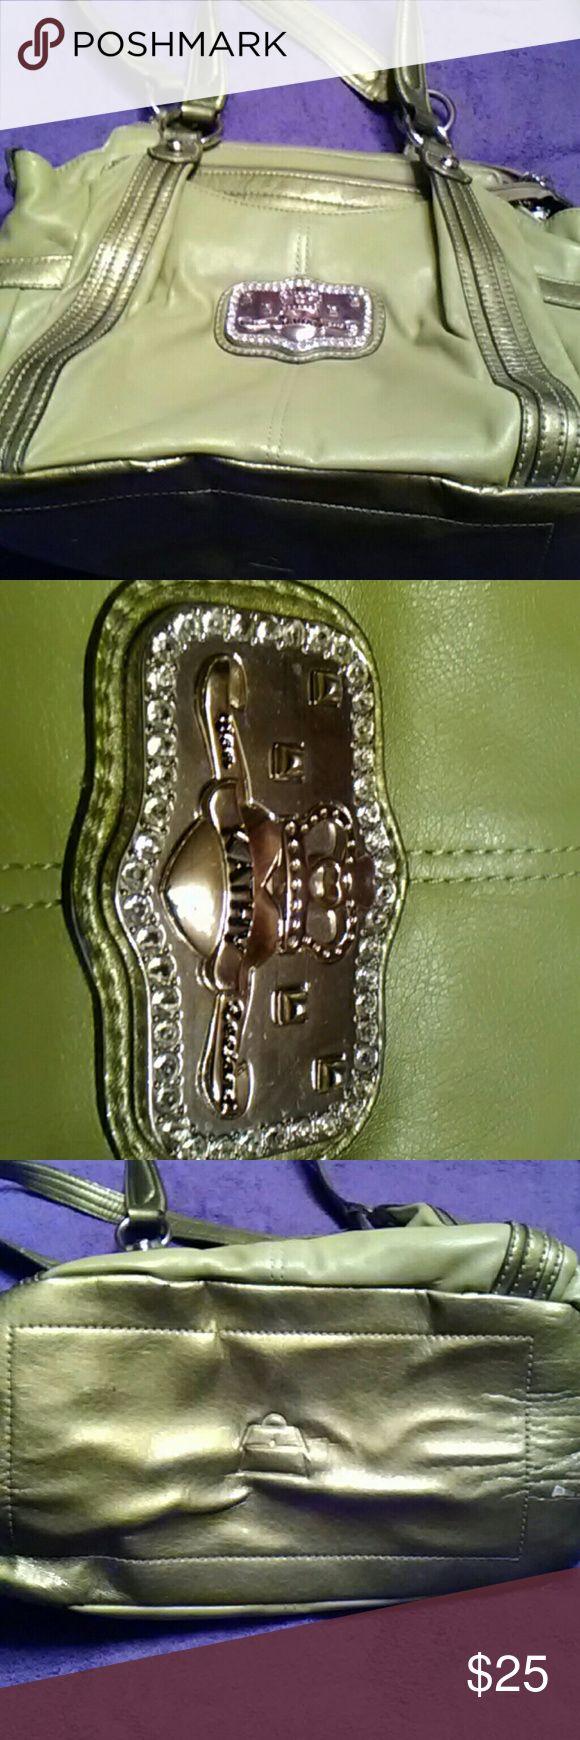 Green Handbag Gently used, some paint chips on bottom of bag Kathy Van Zeeland Bags Satchels